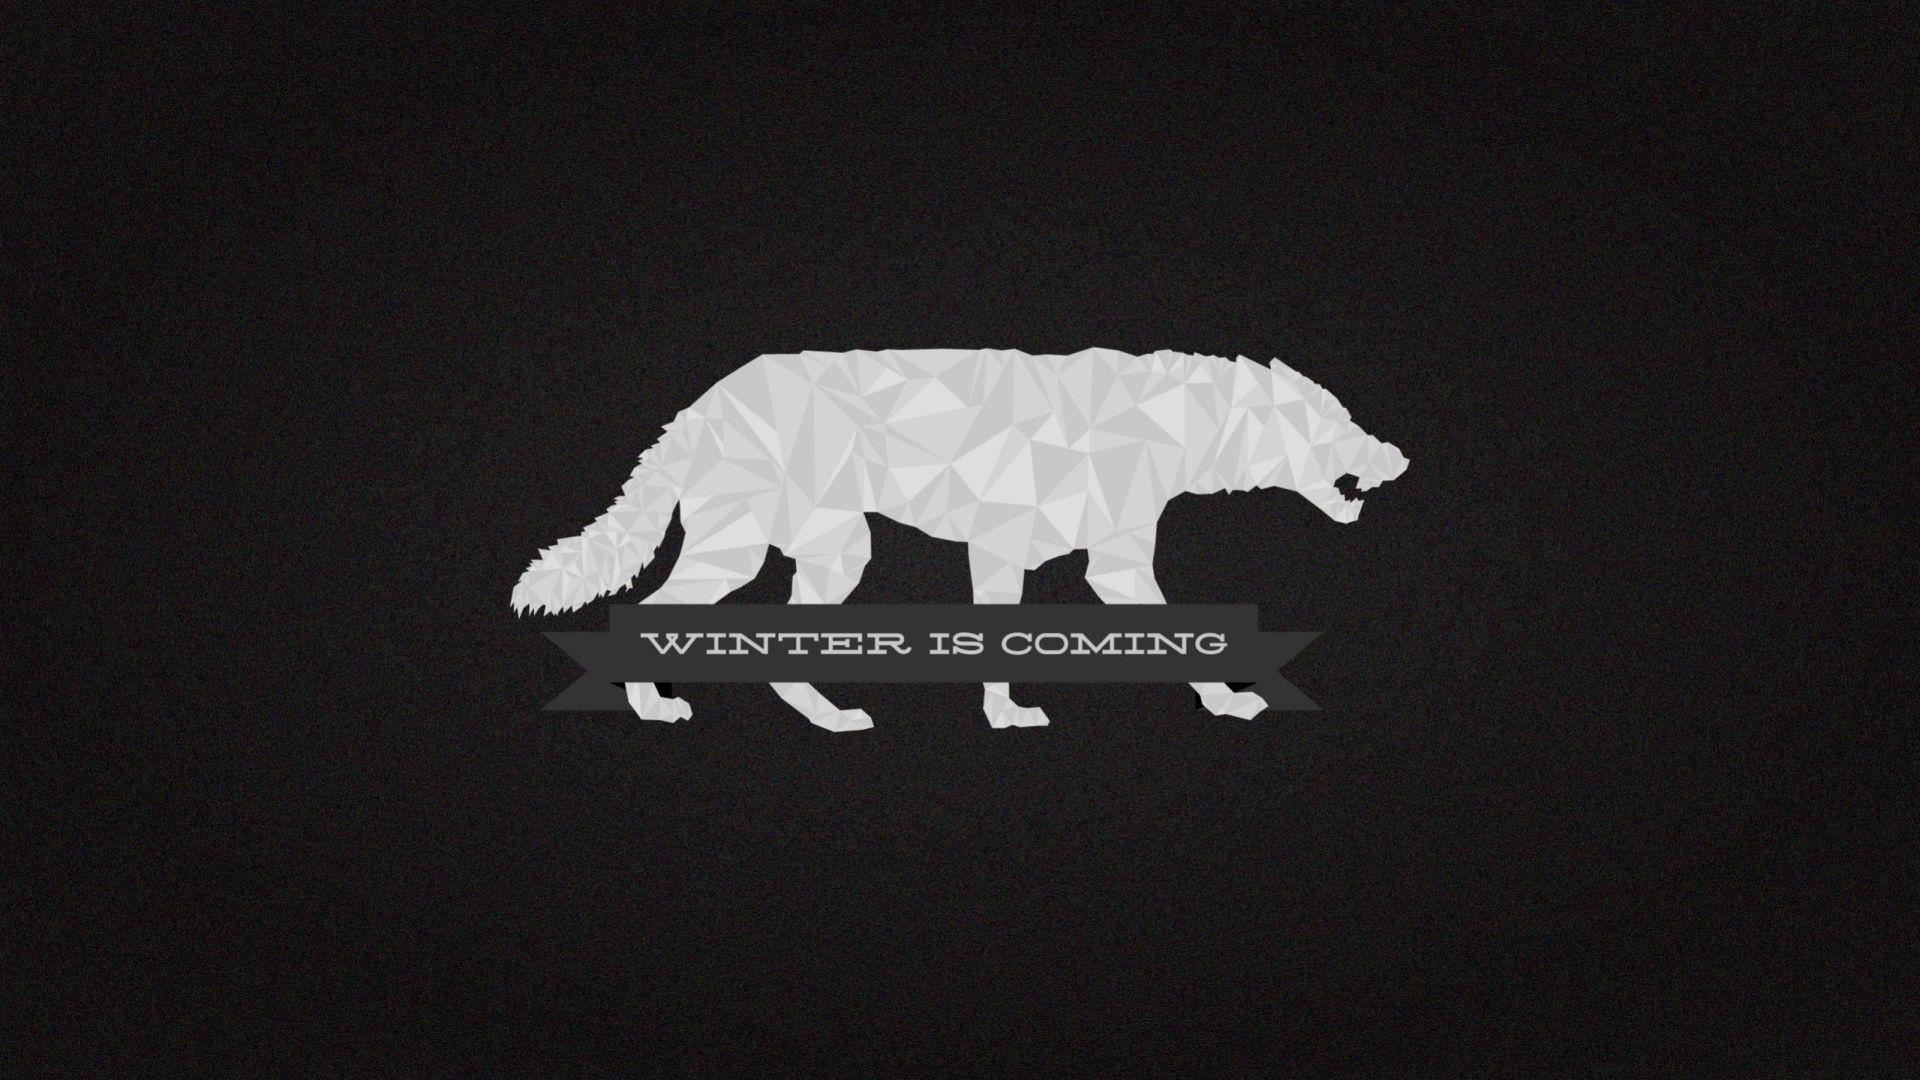 Game of Thrones wolf minimalist